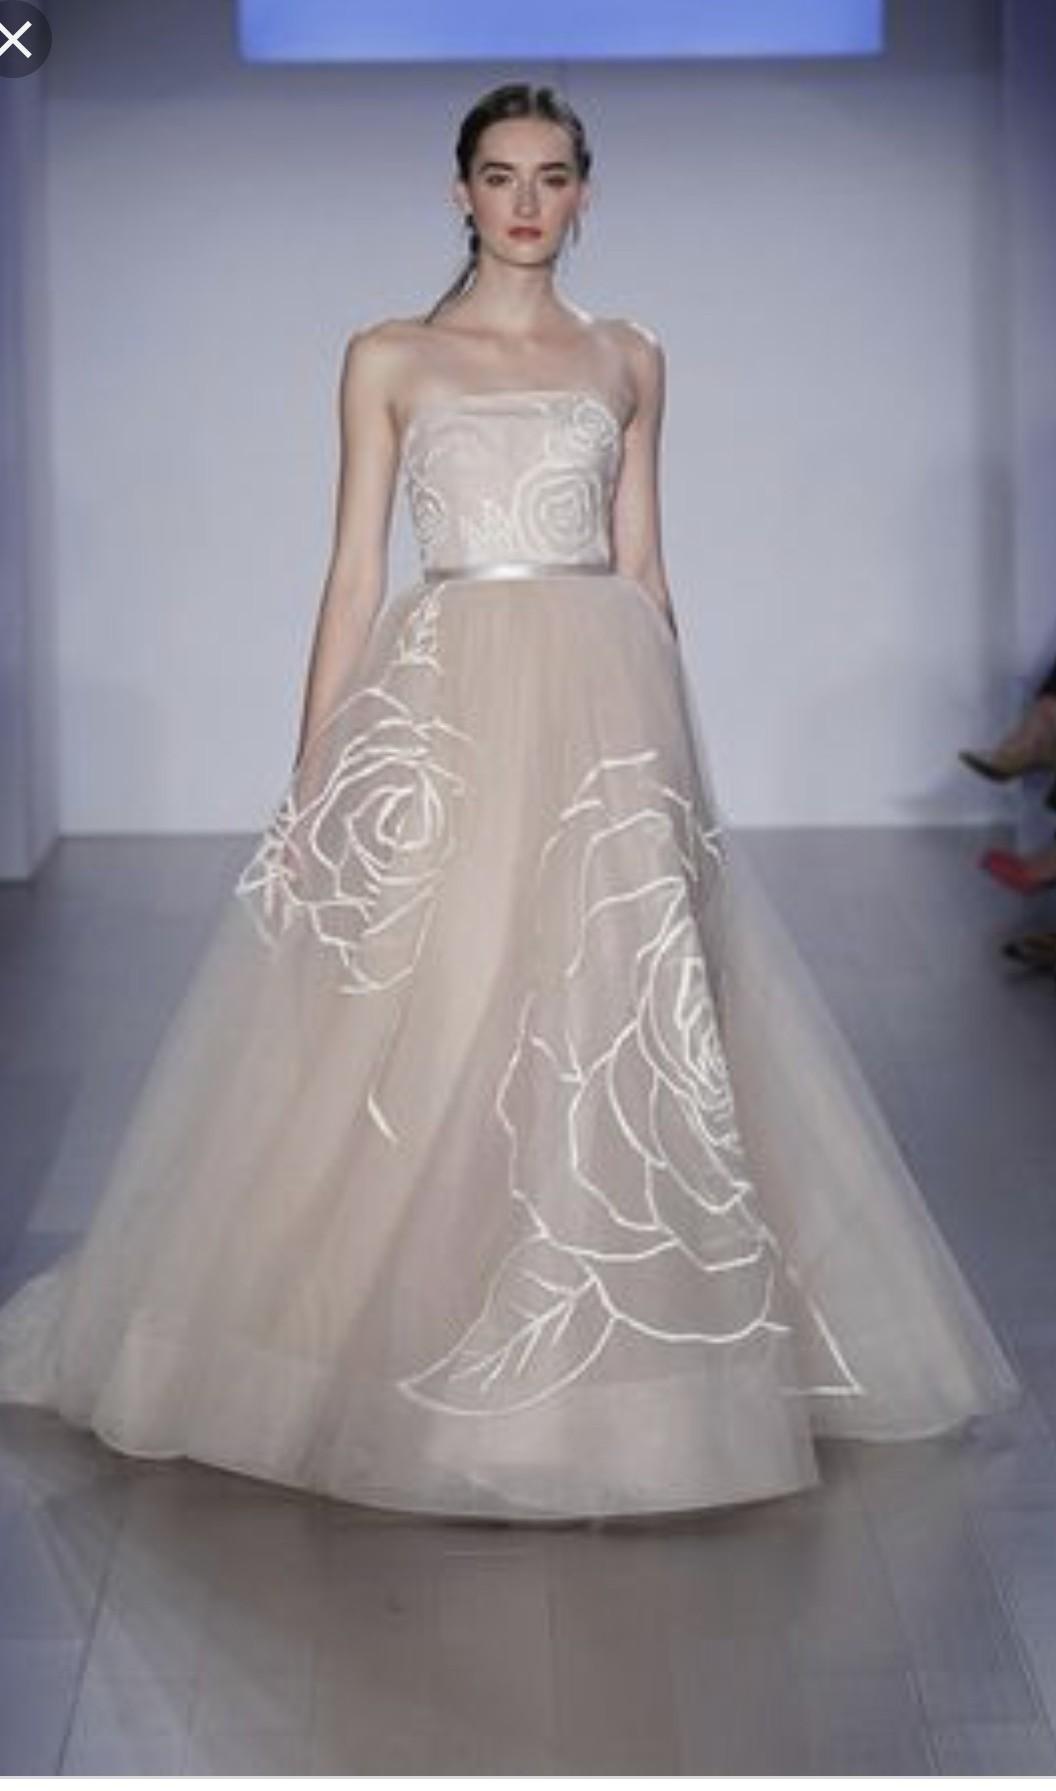 Jim Heljm Wedding Dresses.Jim Hjelm Size 2